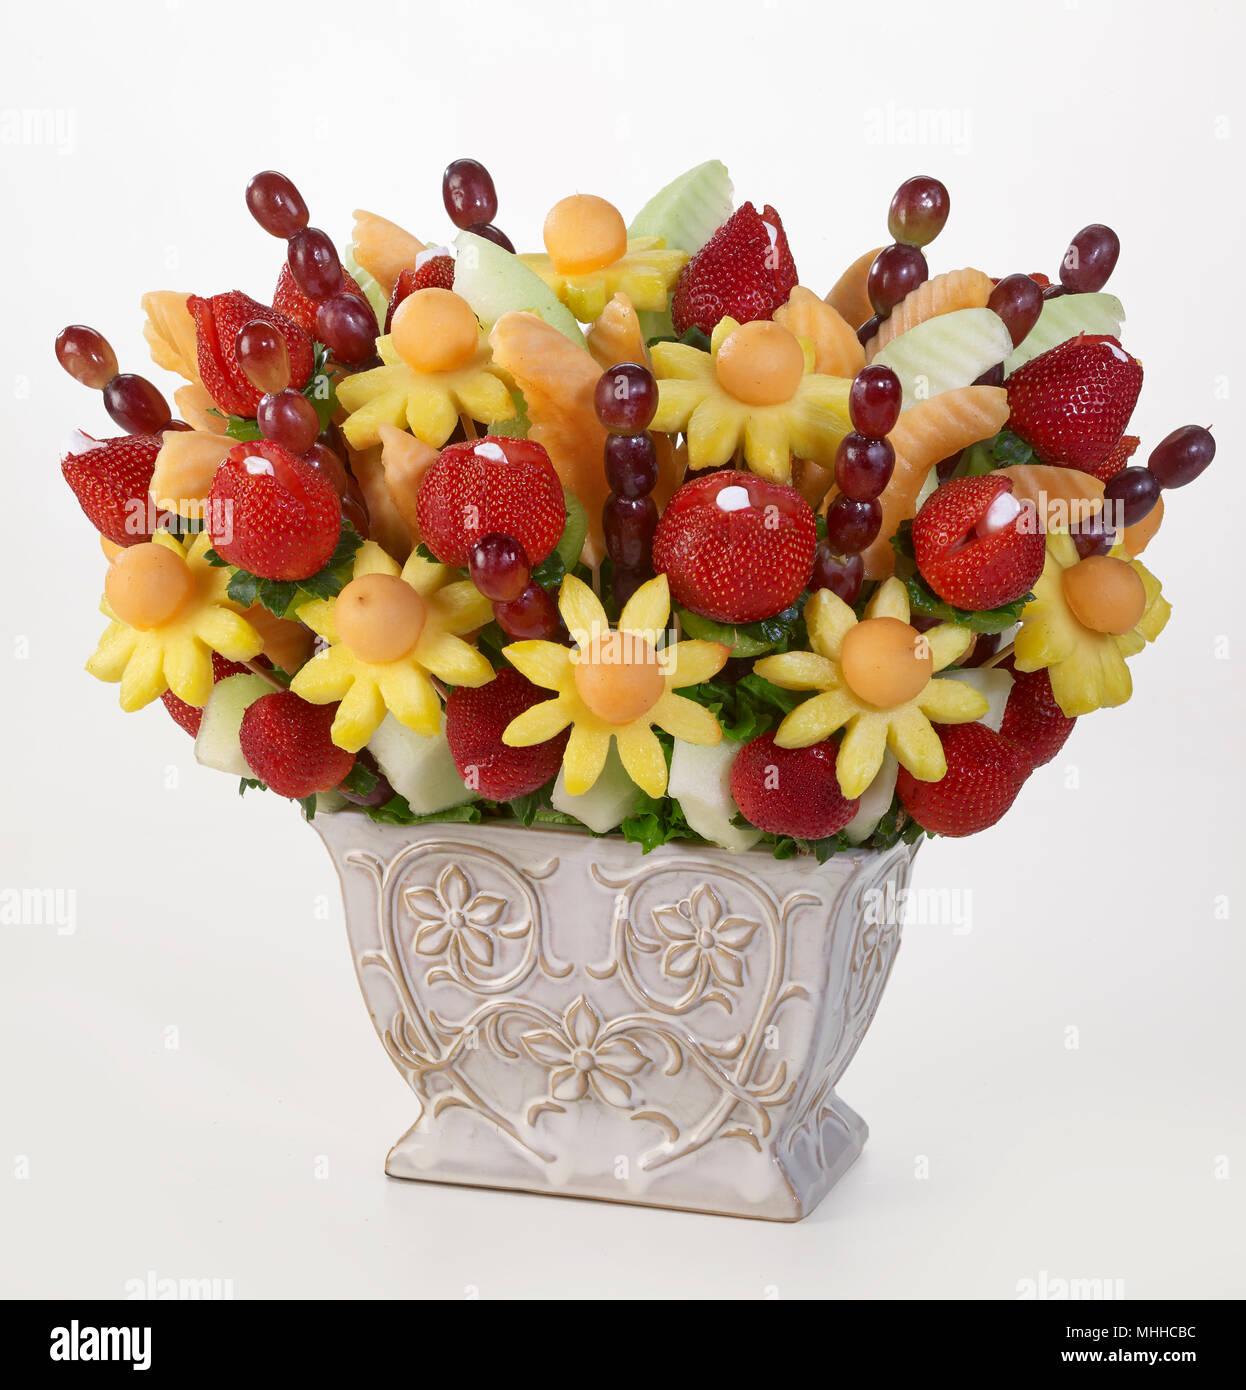 Fruit Flowers Bouquet Stock Photo: 182935744 - Alamy